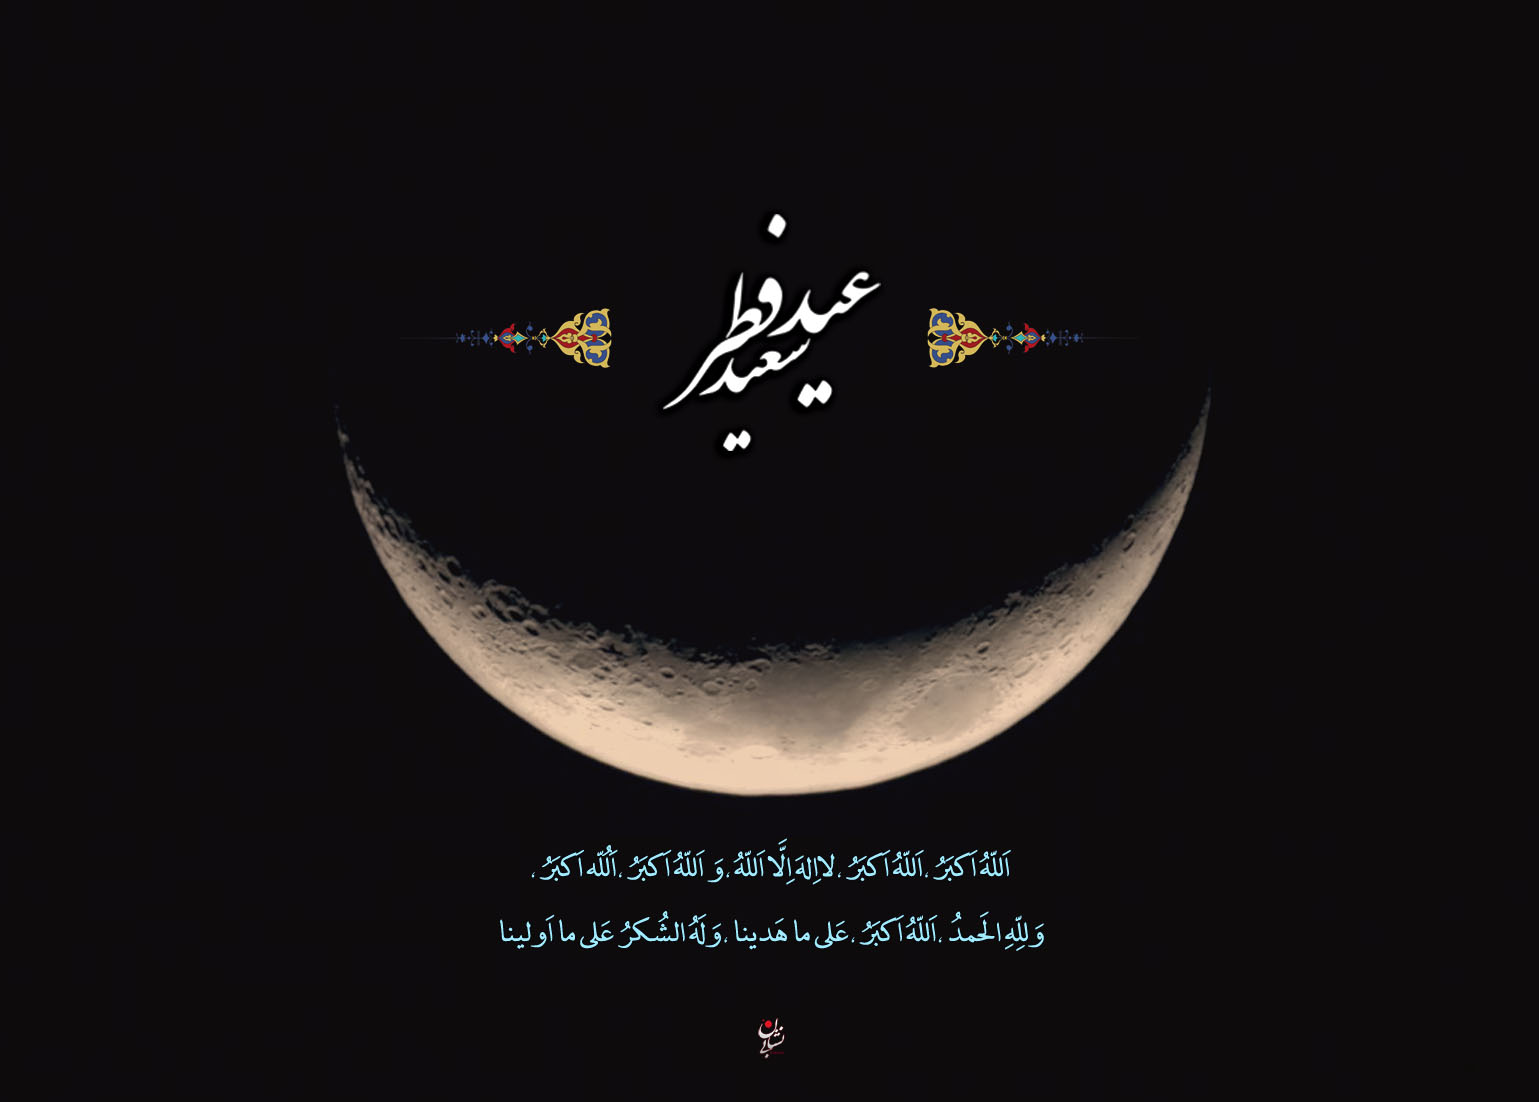 Photo of عکس پروفایل تبریک عید فطر 99 + متن و جملات کوتاه تبریک عید فطر ماه رمضان